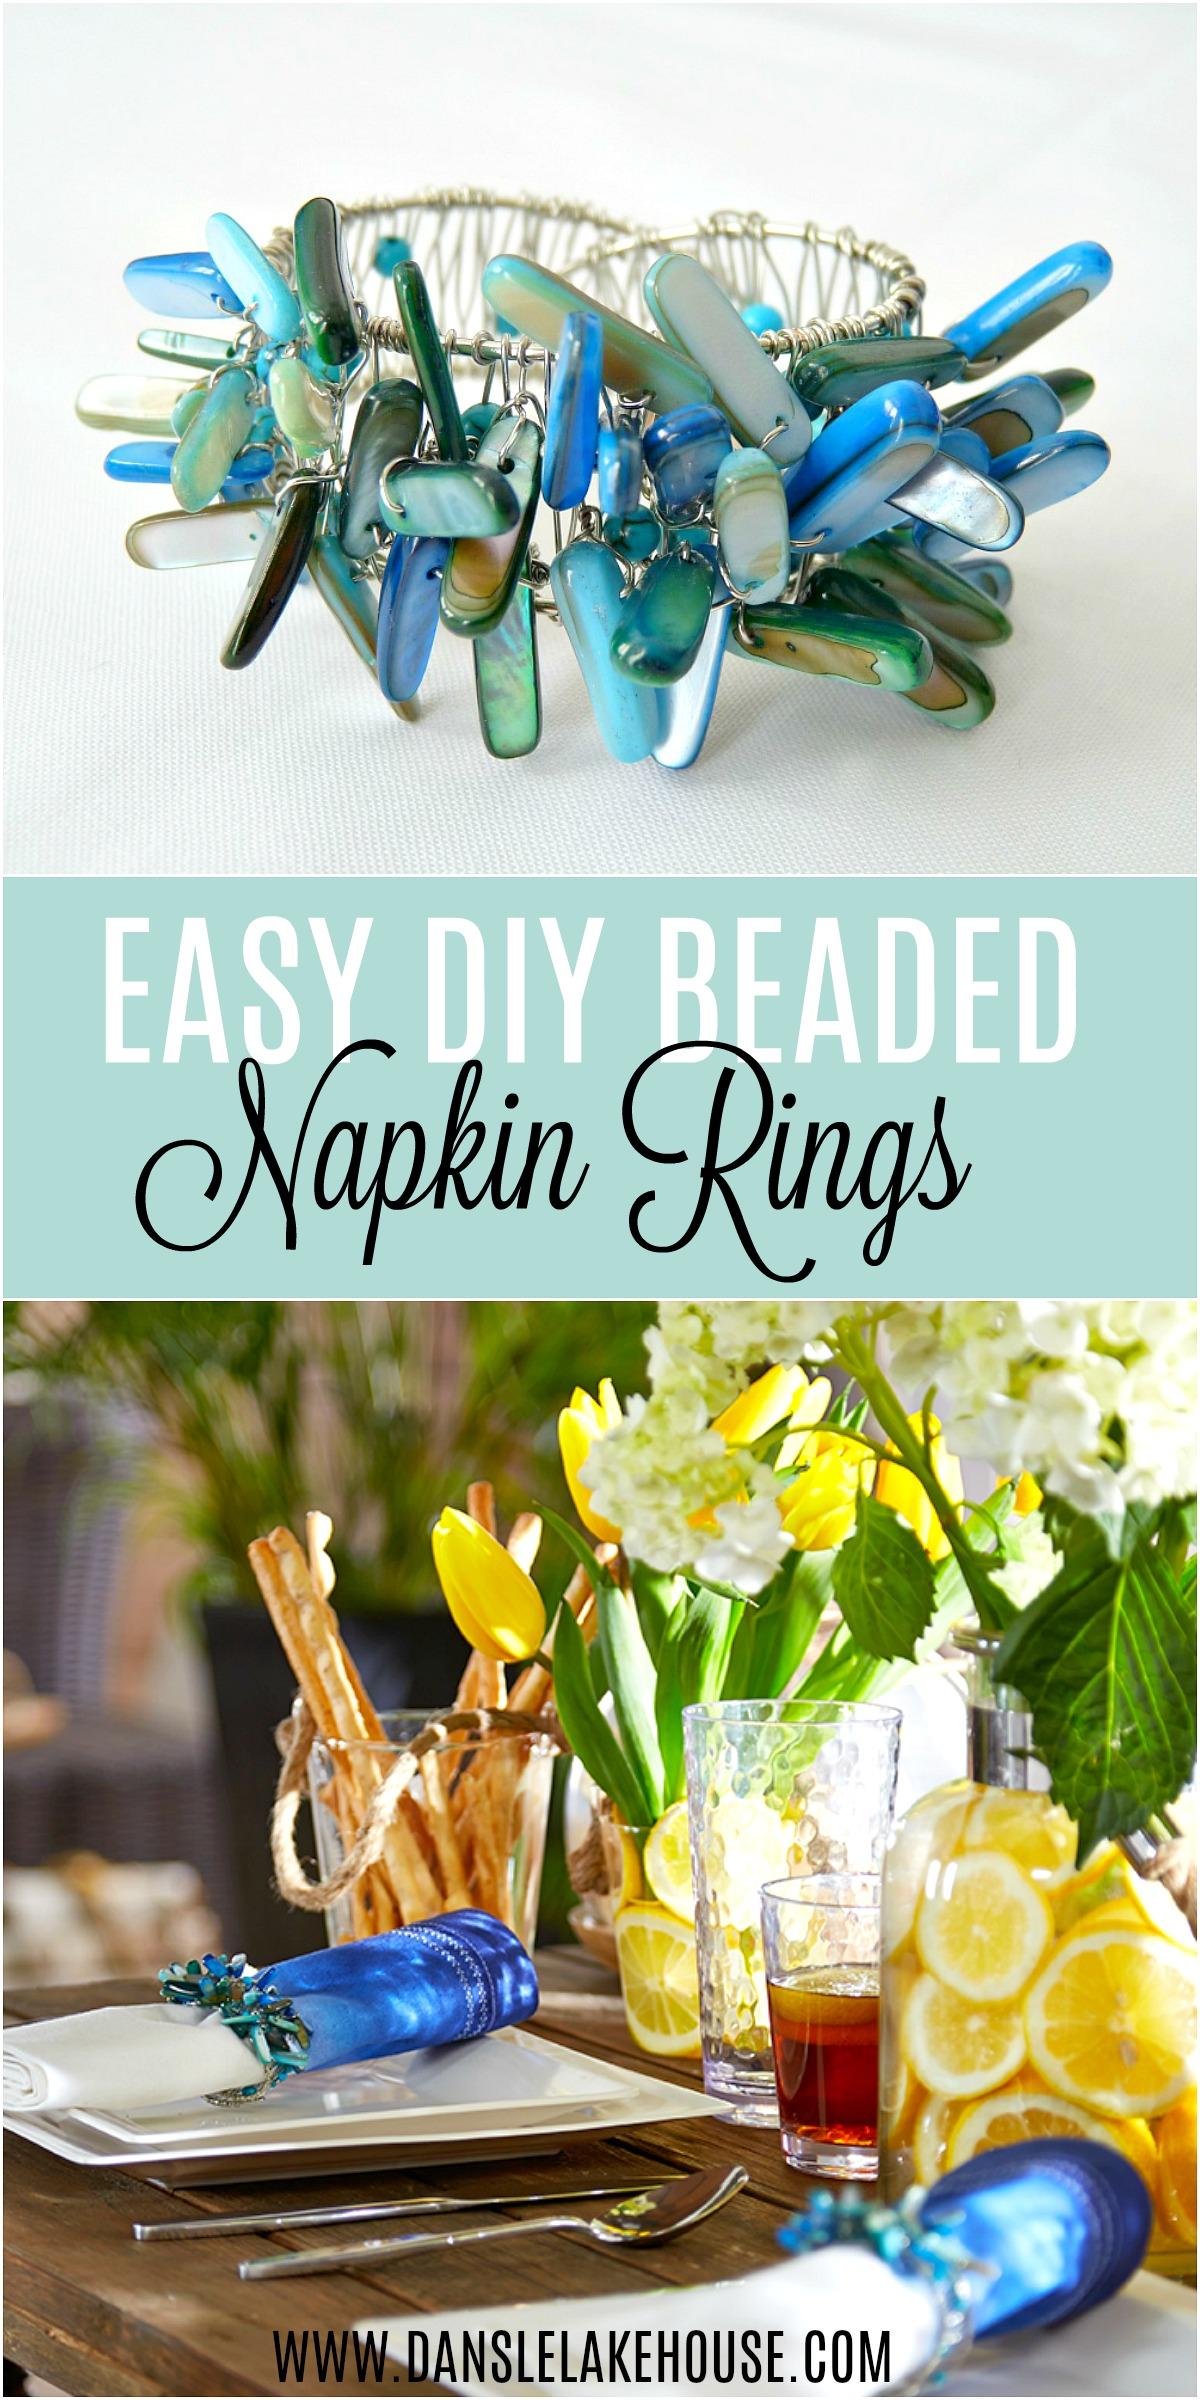 DIY Beaded Napkin Ring - Easy Tutorial + Video